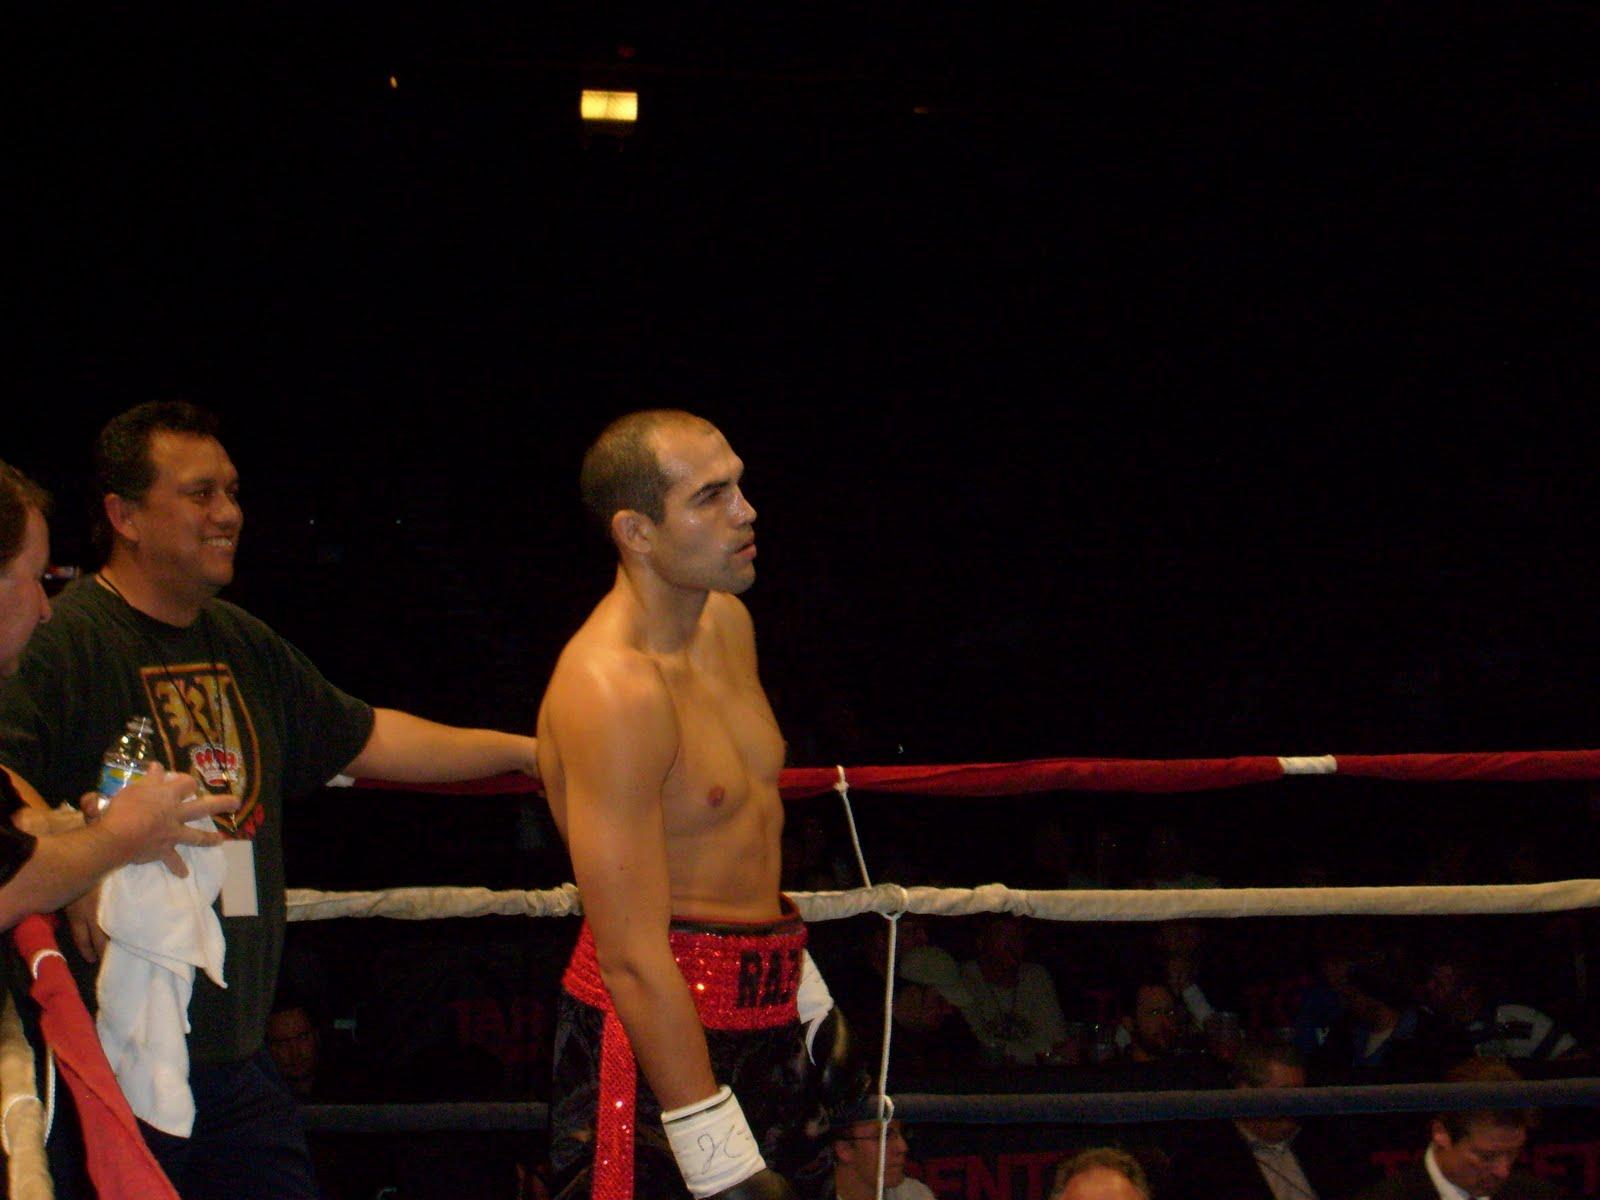 [Friday+Dec.+4,+2009+fights+at+Target+Center,+Abell-Butler+072.jpg]